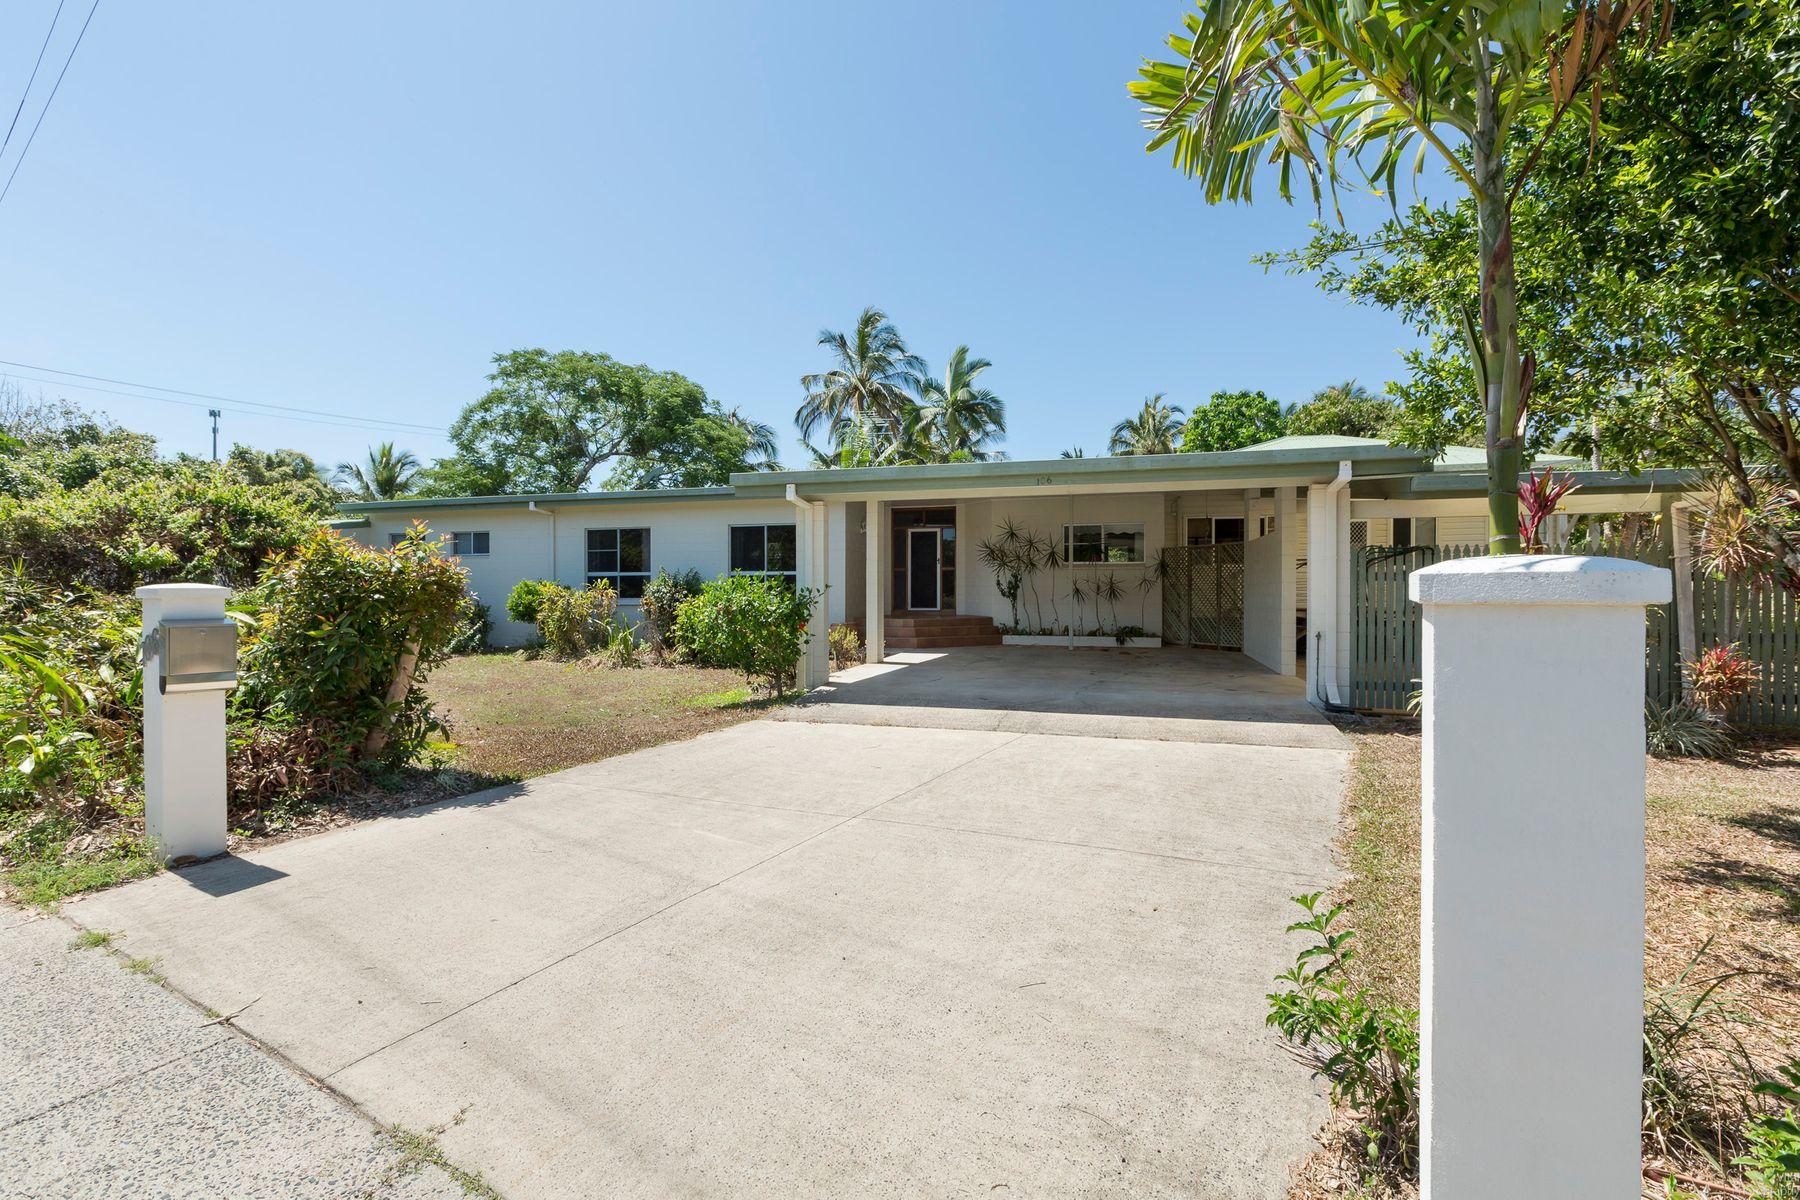 106 Bay Road, Innisfail, QLD 4860